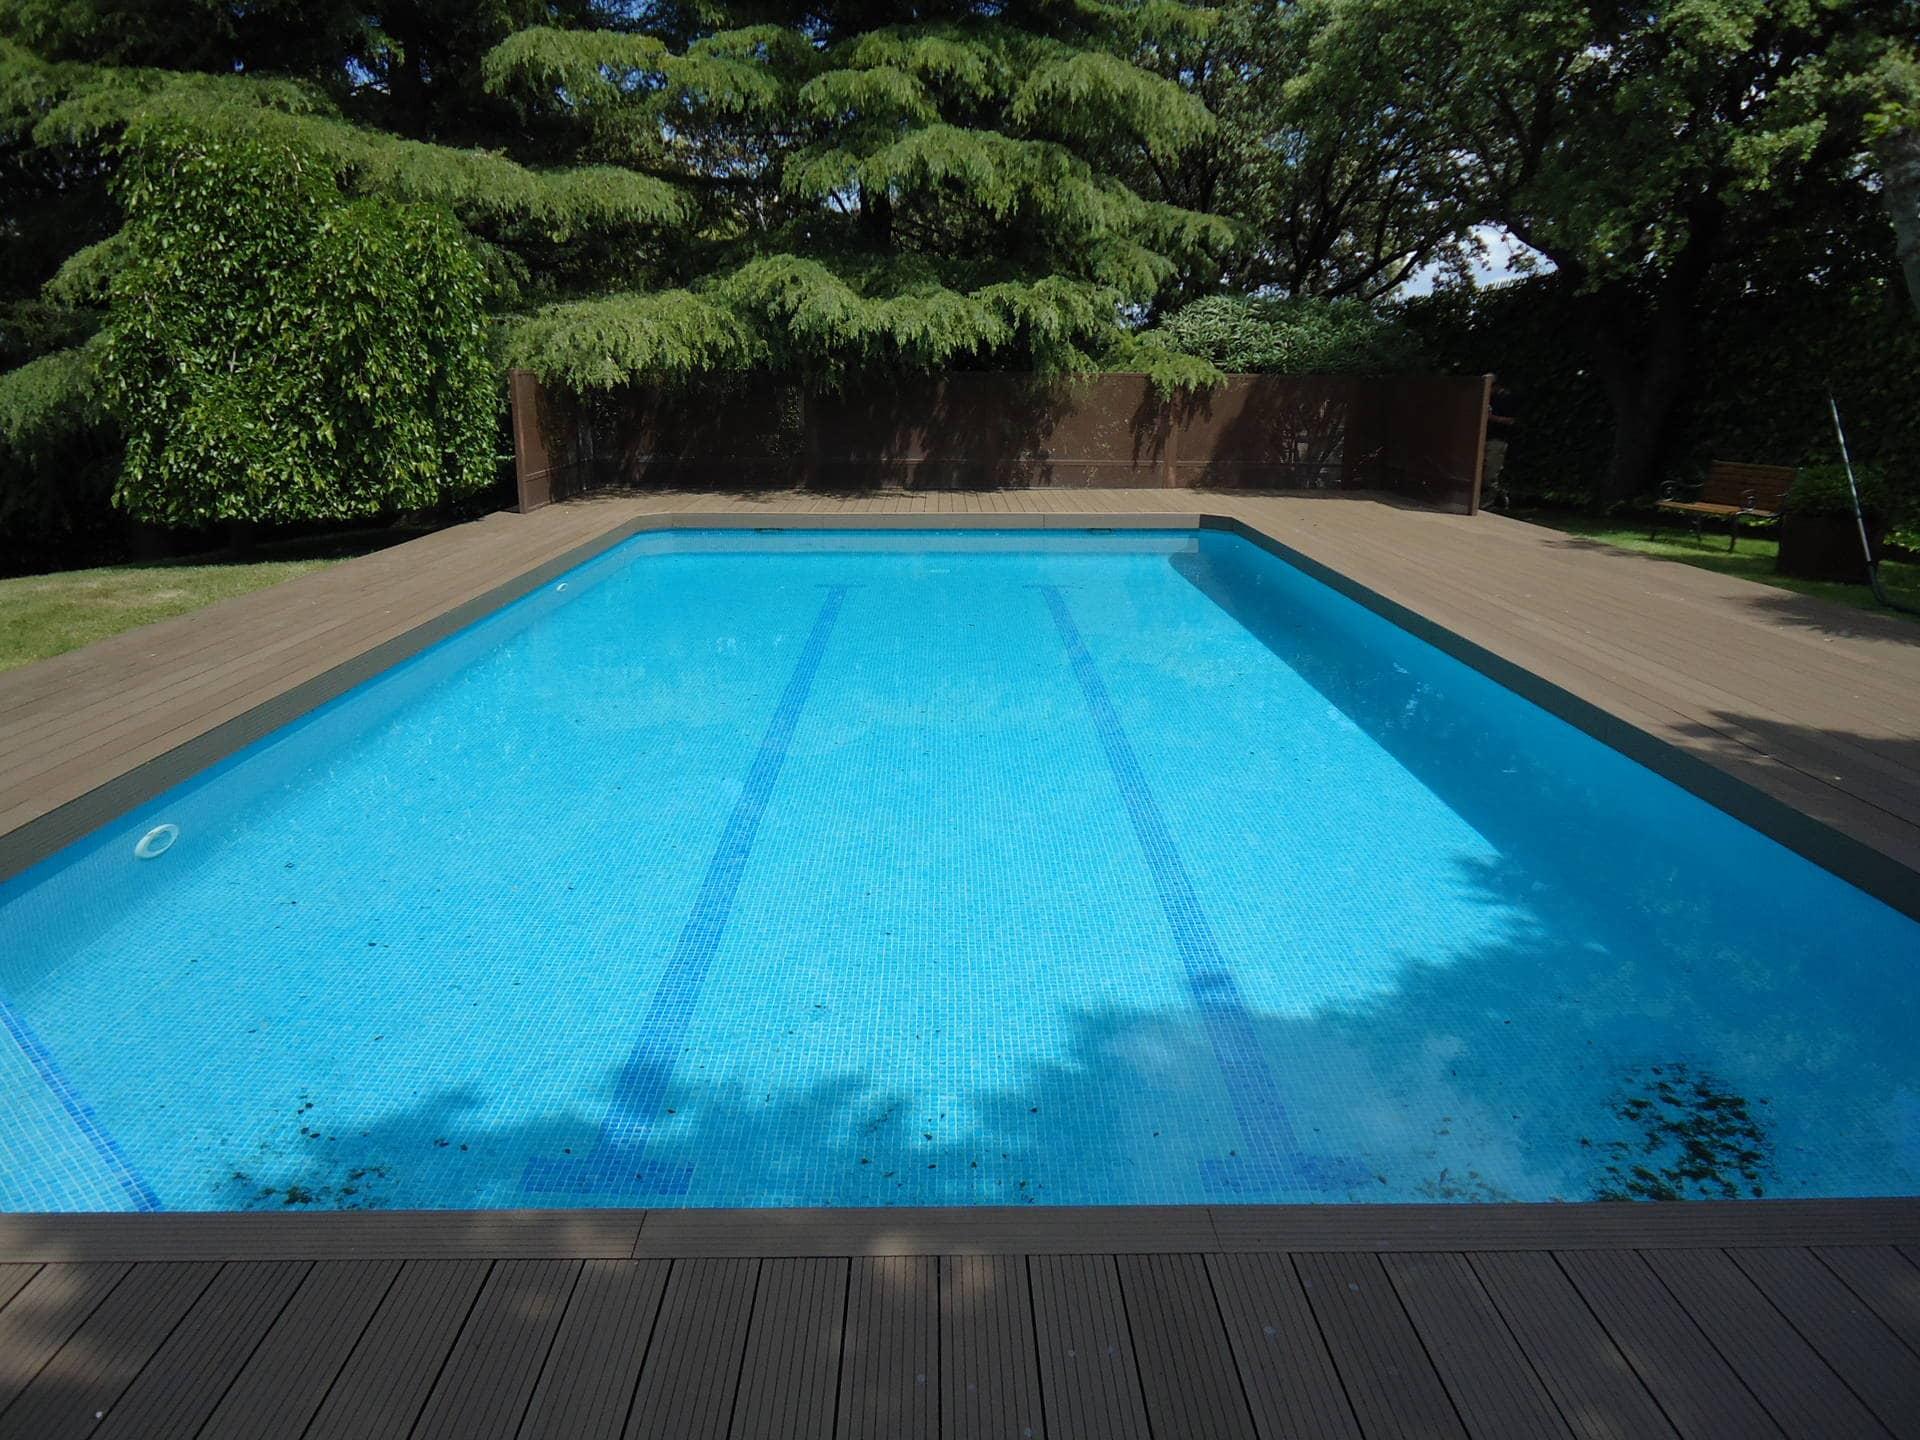 Suelos para piscinas exterior elegant piscinas con - Suelos piscinas exteriores ...